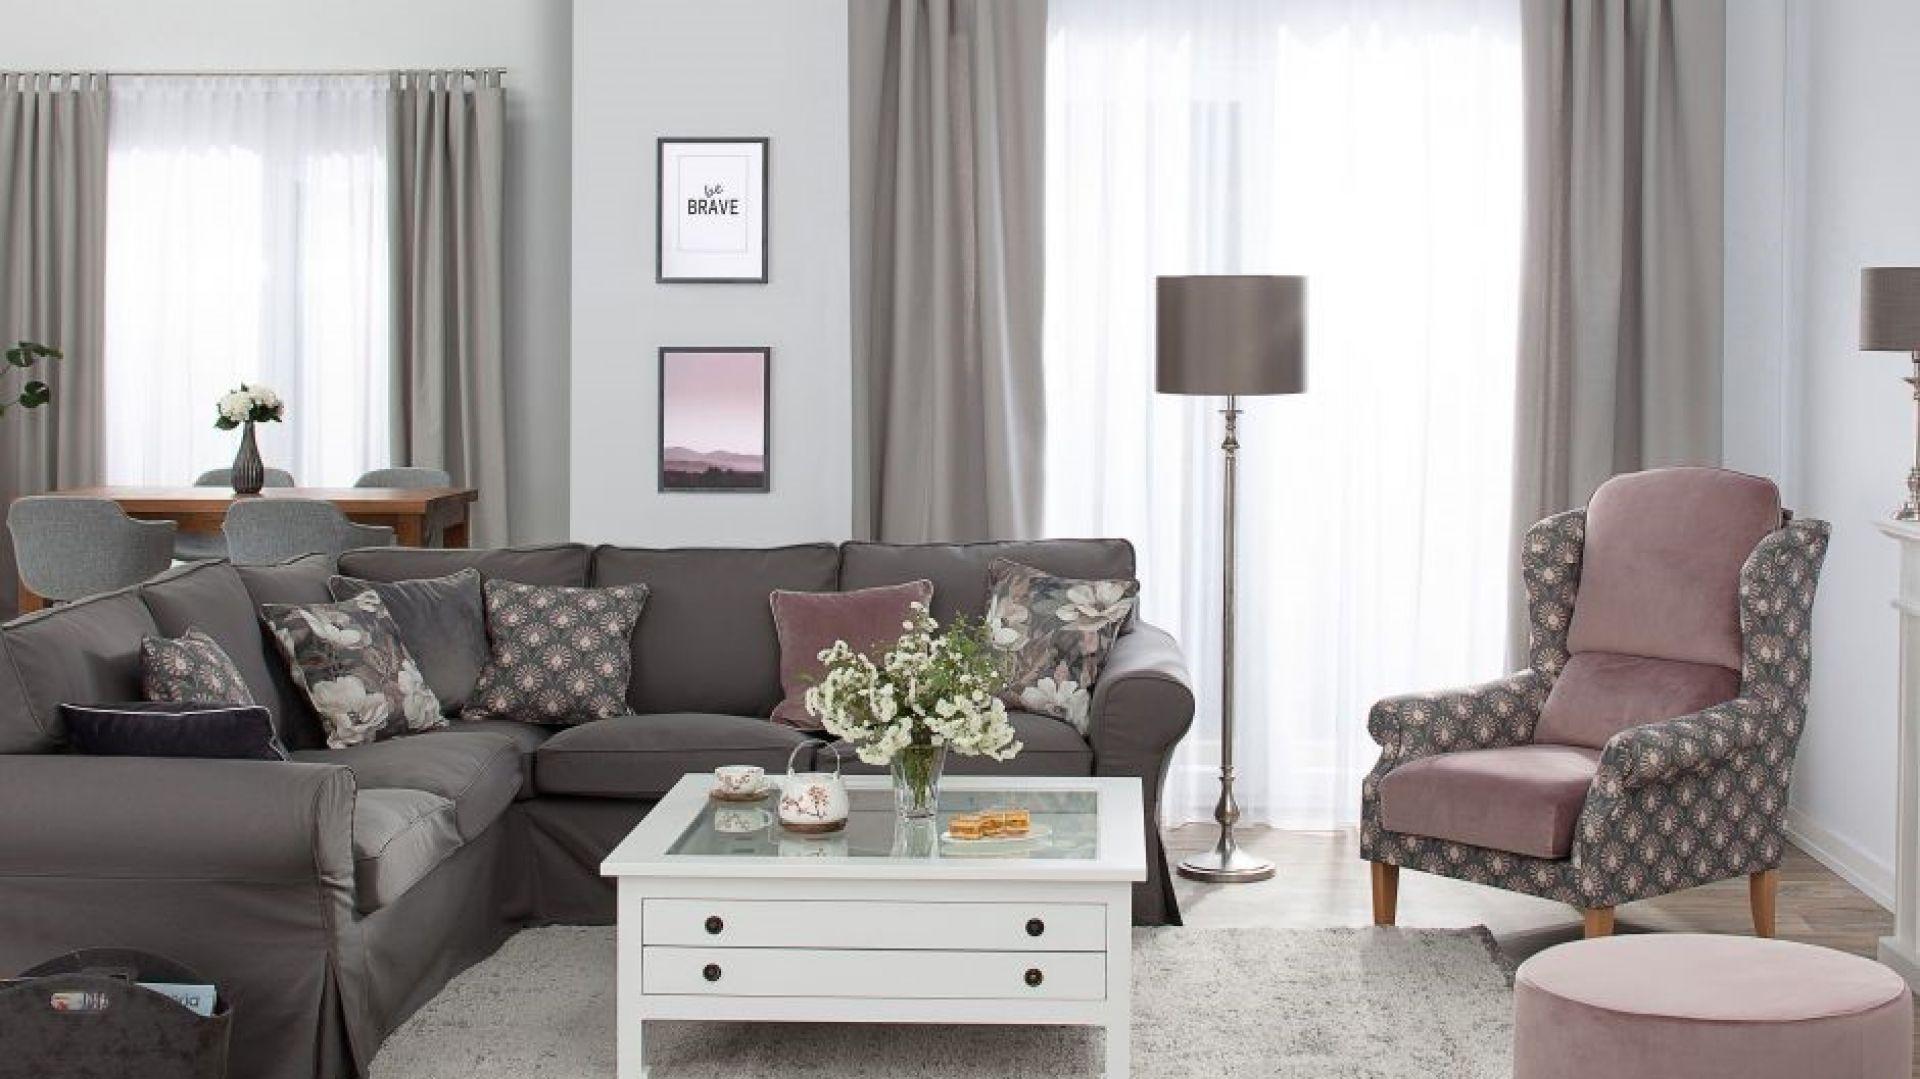 Pokrowiec na sofę, kolekcja Cotton Panama. Fot. Dekoria.pl